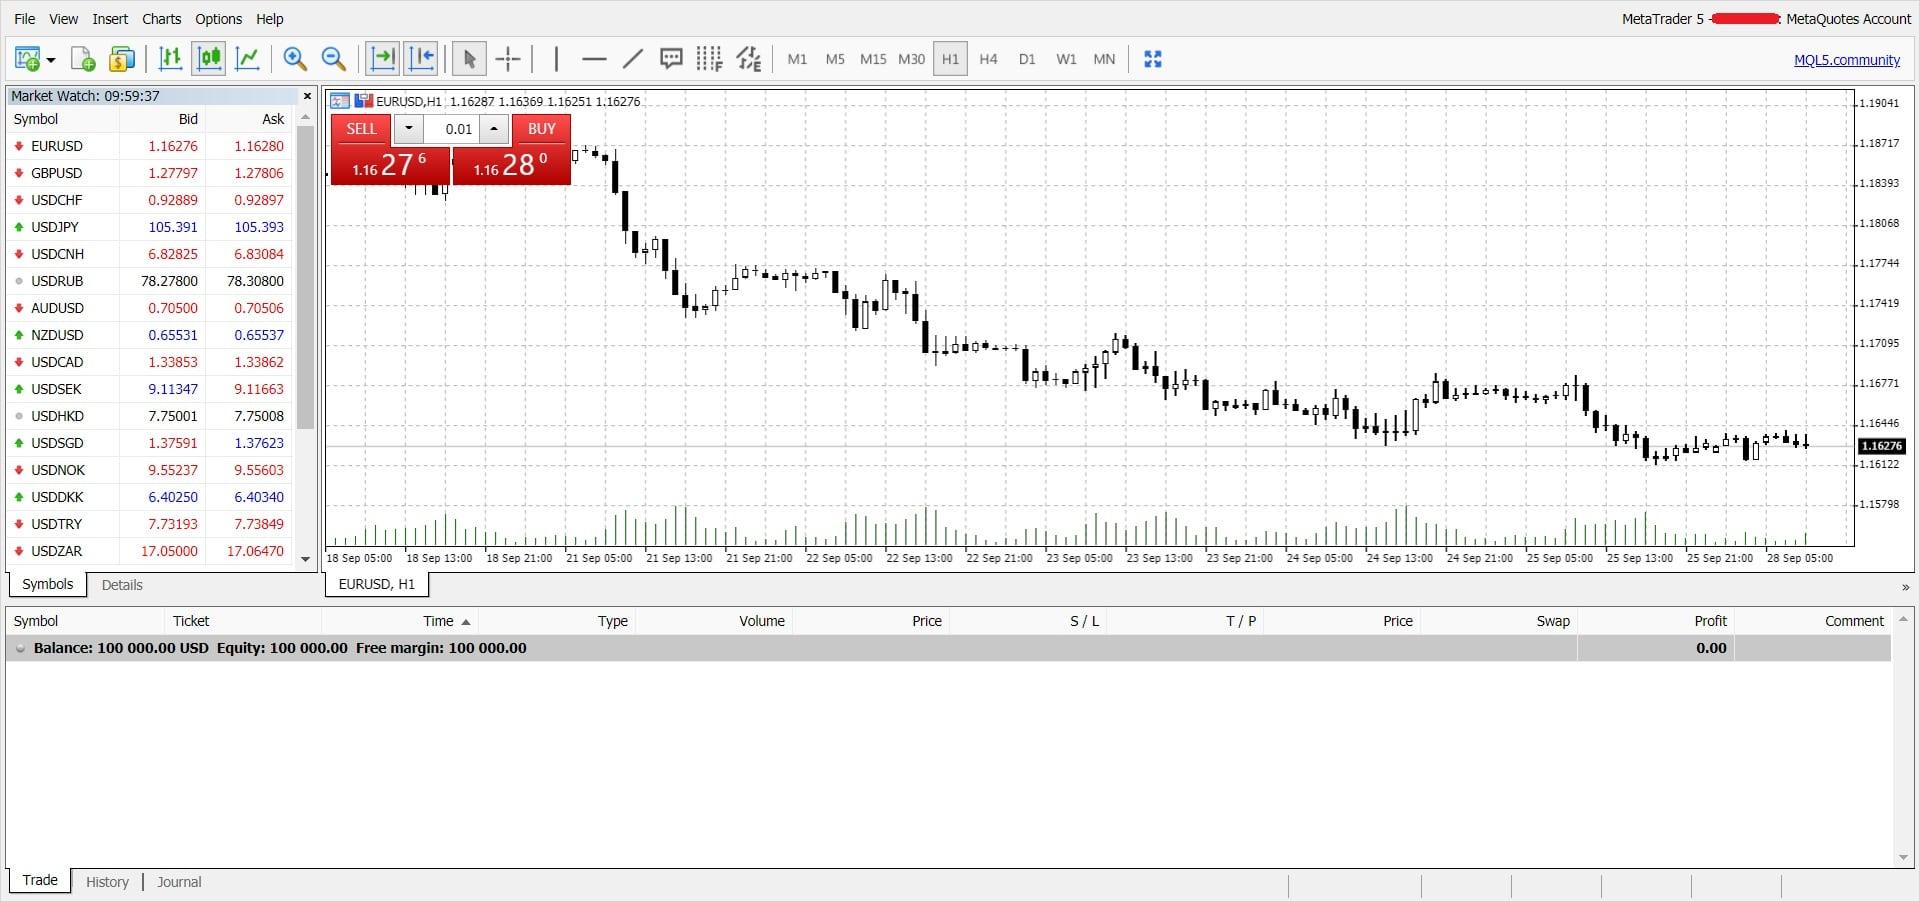 Markets.com MetaTrader 5 (MT5) platform